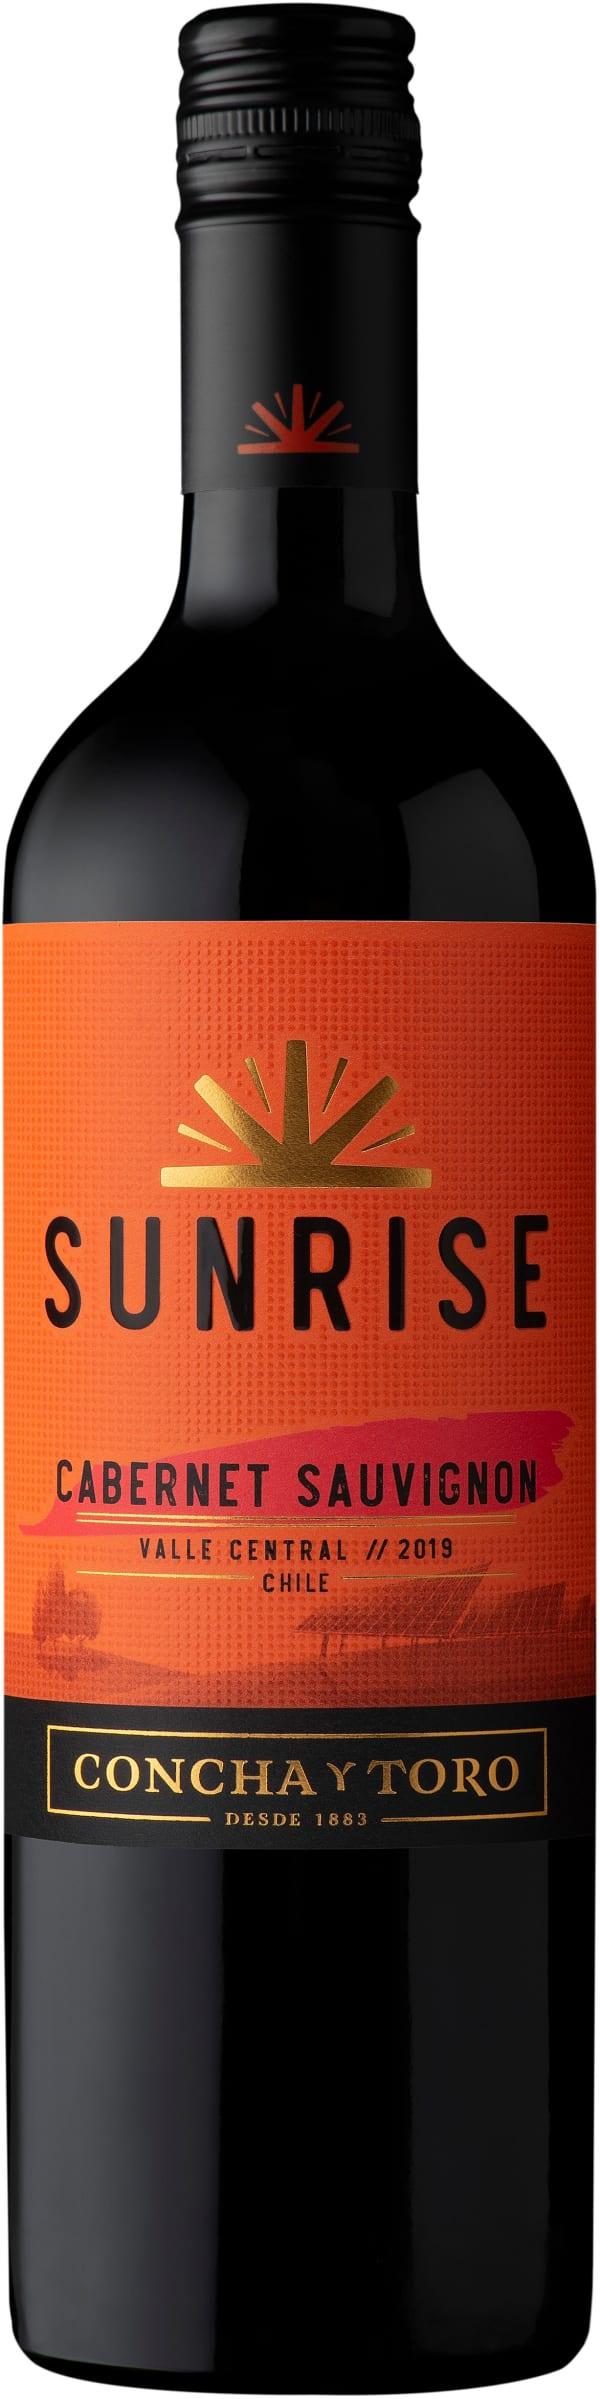 Sunrise Cabernet Sauvignon 2019